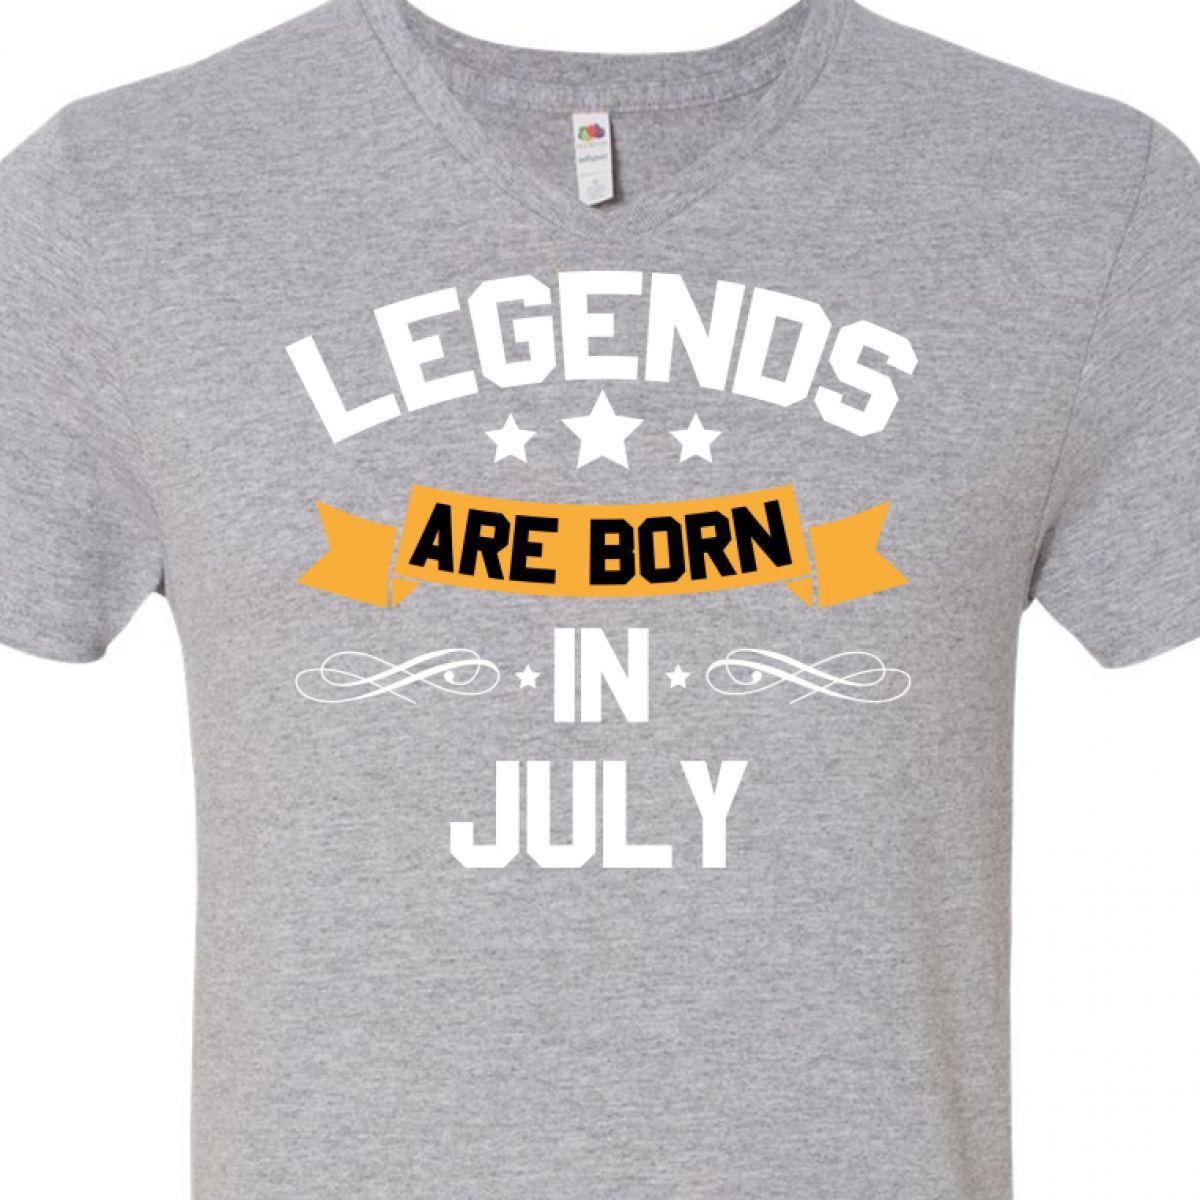 7ea072c6 INKtastic Legends Are Born in July Men's V-neck T-shirt Birthdays ...